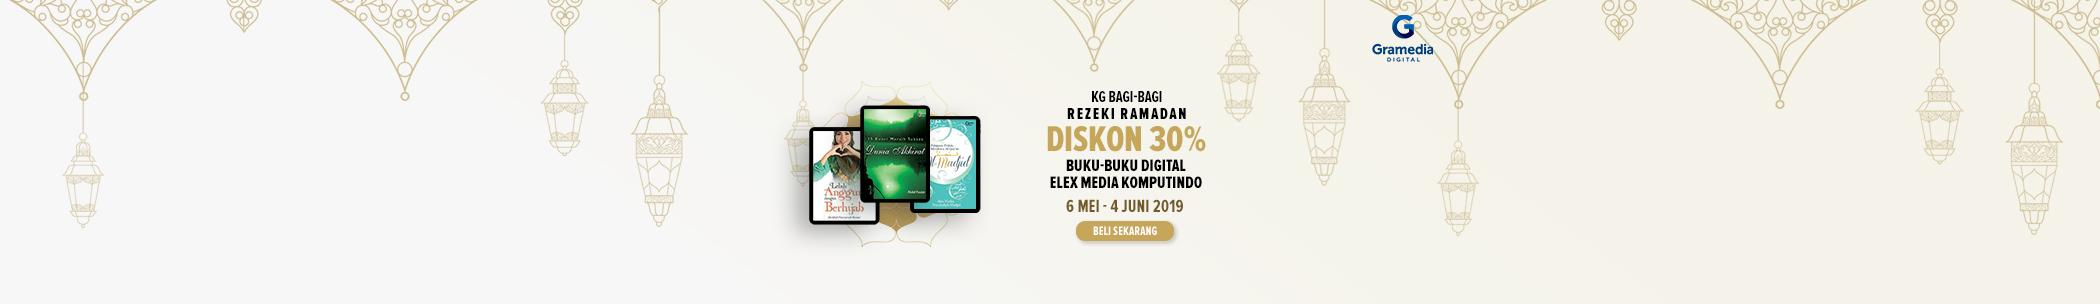 KG Ramadan - Elex